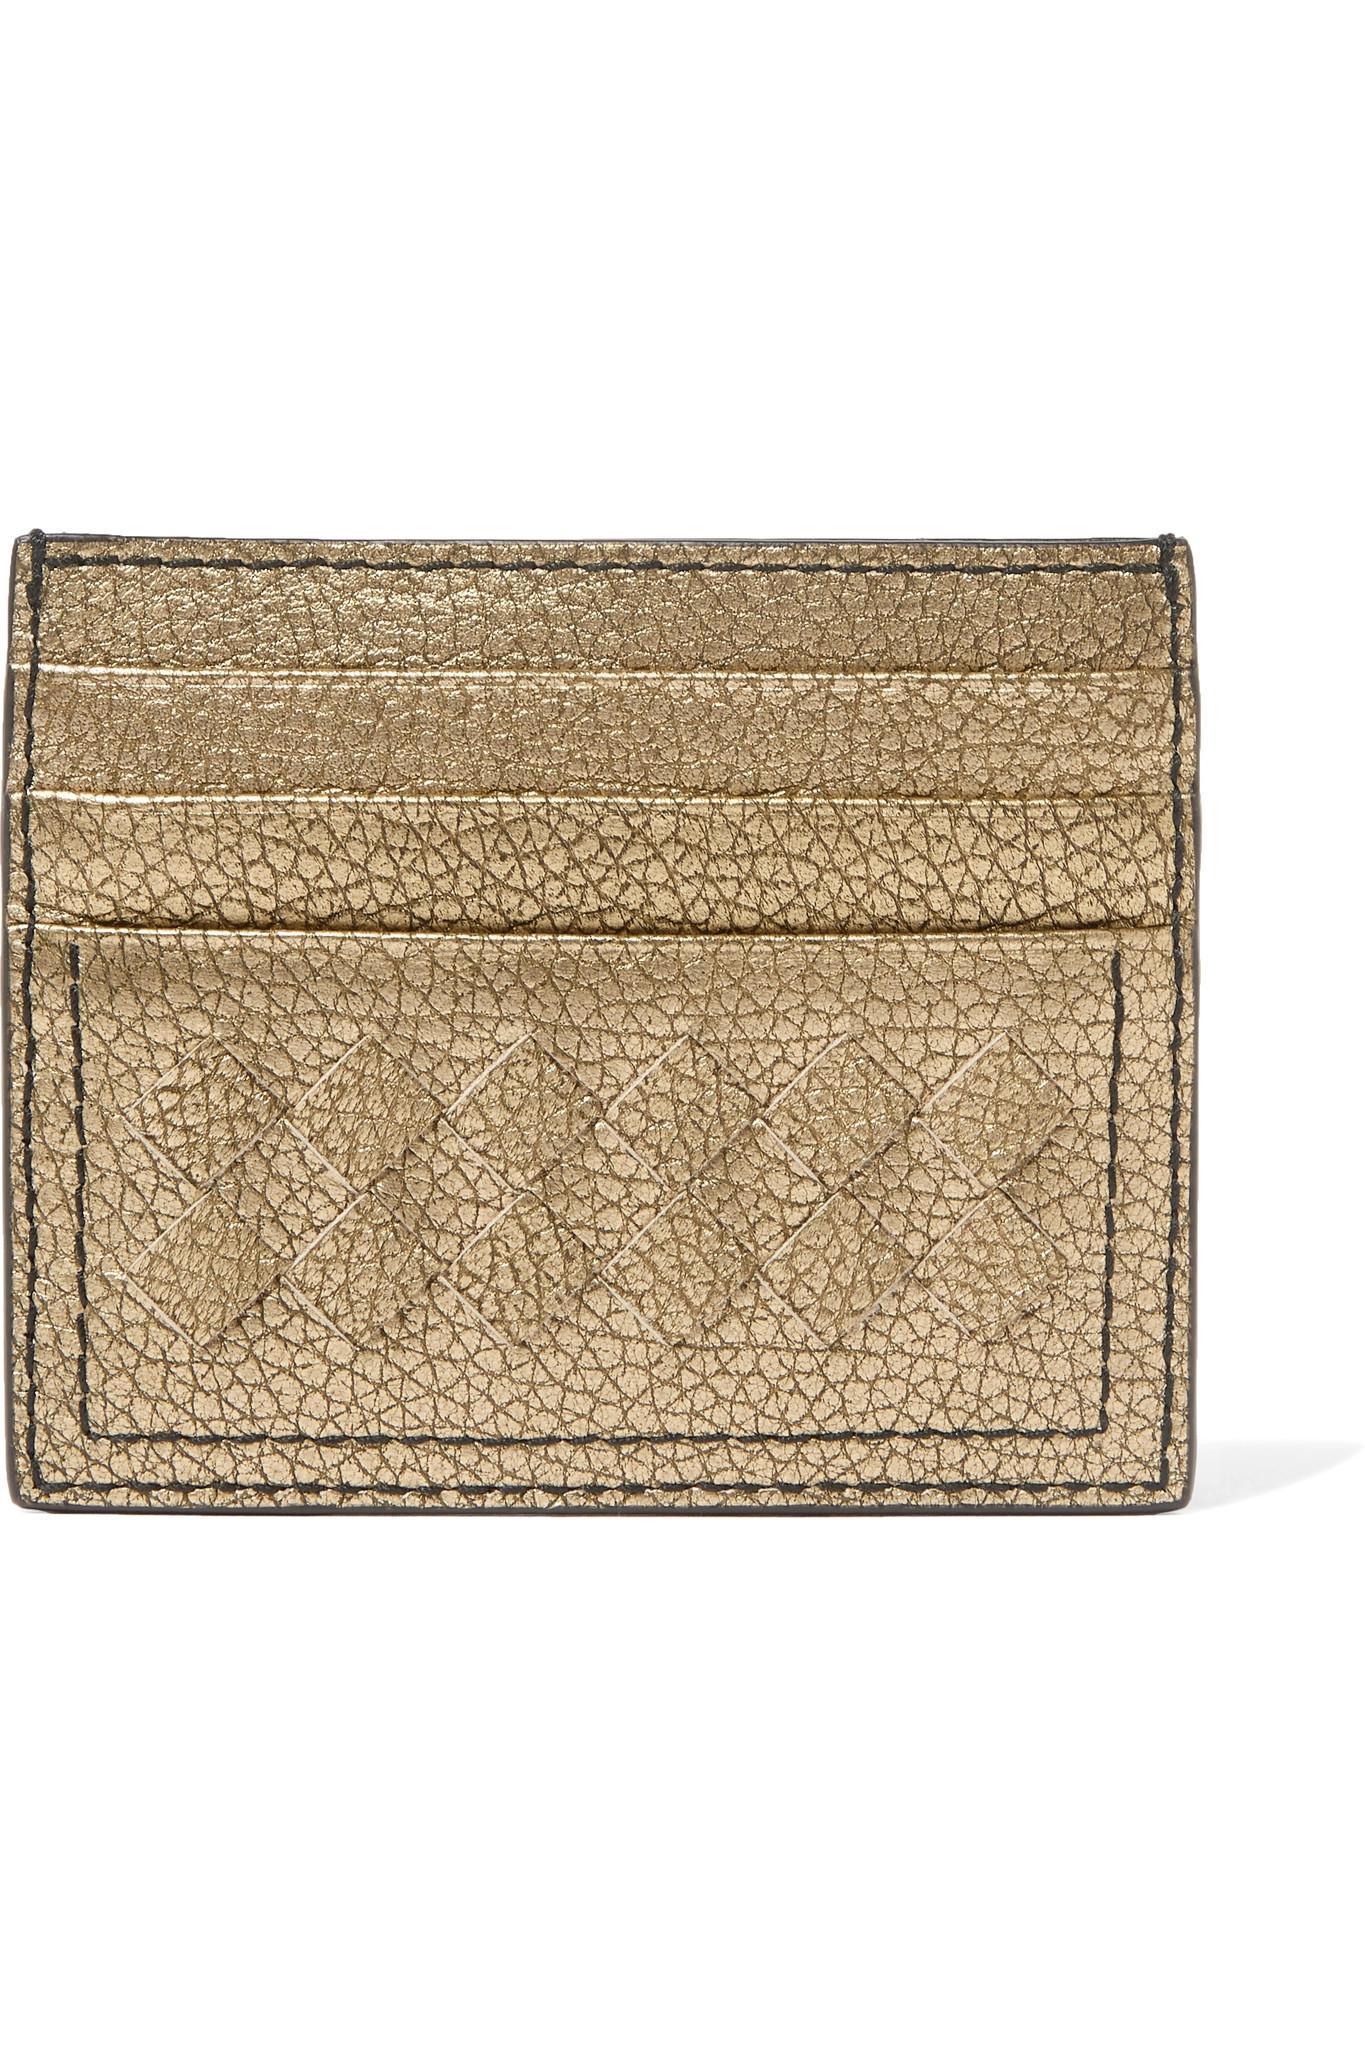 cdcb6b169 Bottega Veneta Metallic Intrecciato Textured-leather Cardholder in ...